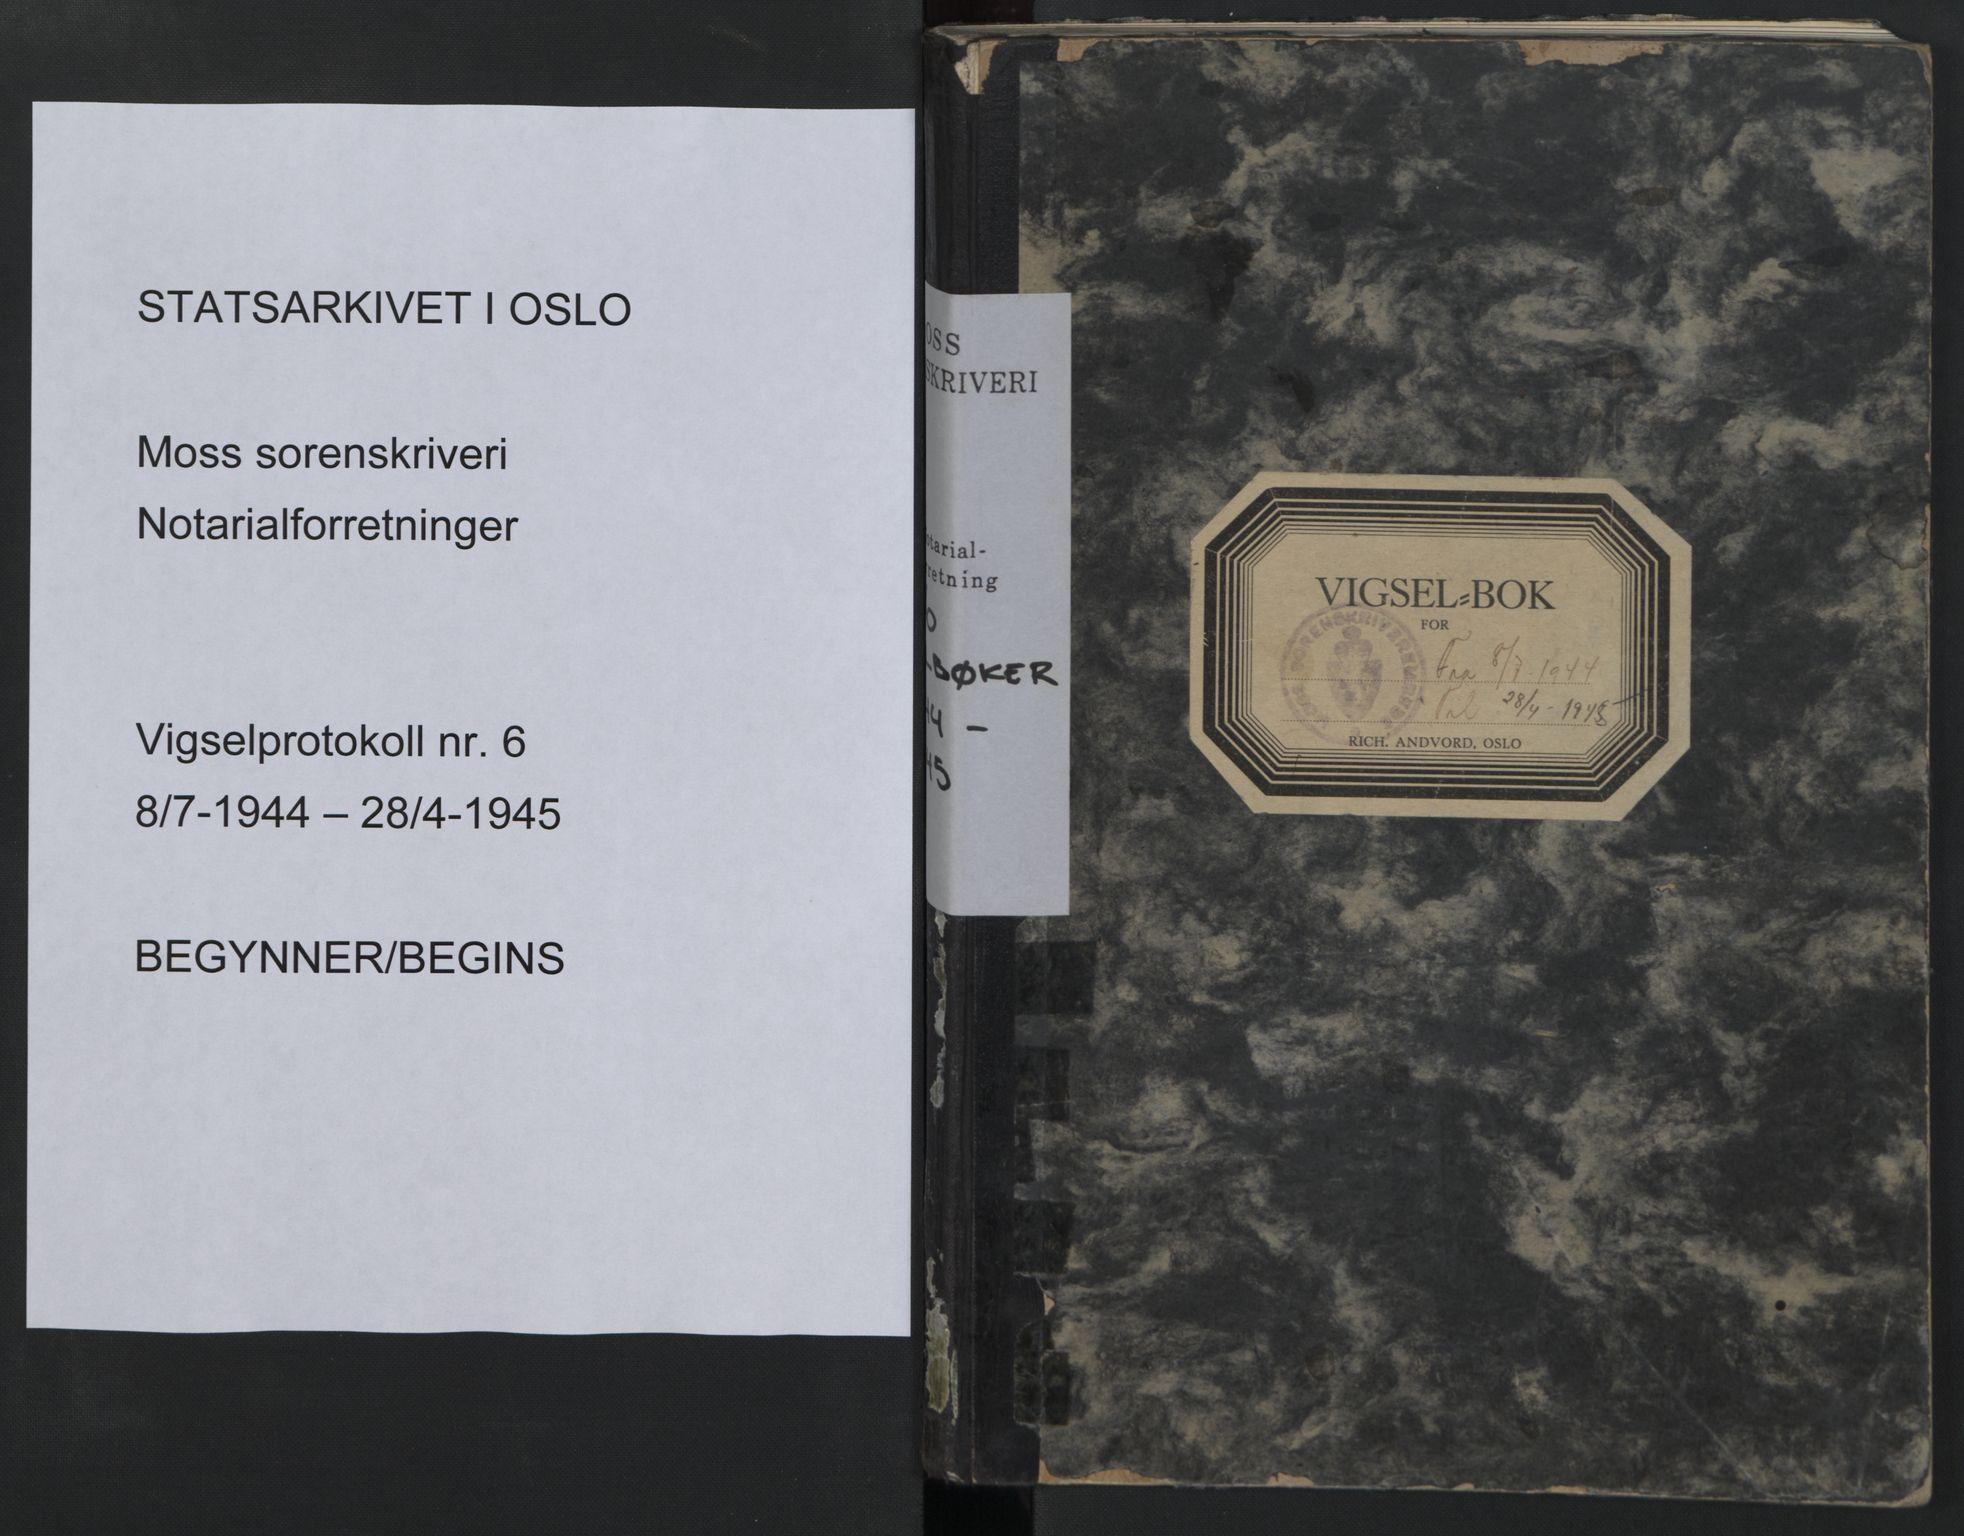 SAO, Moss sorenskriveri, 1944-1945, s. upaginert